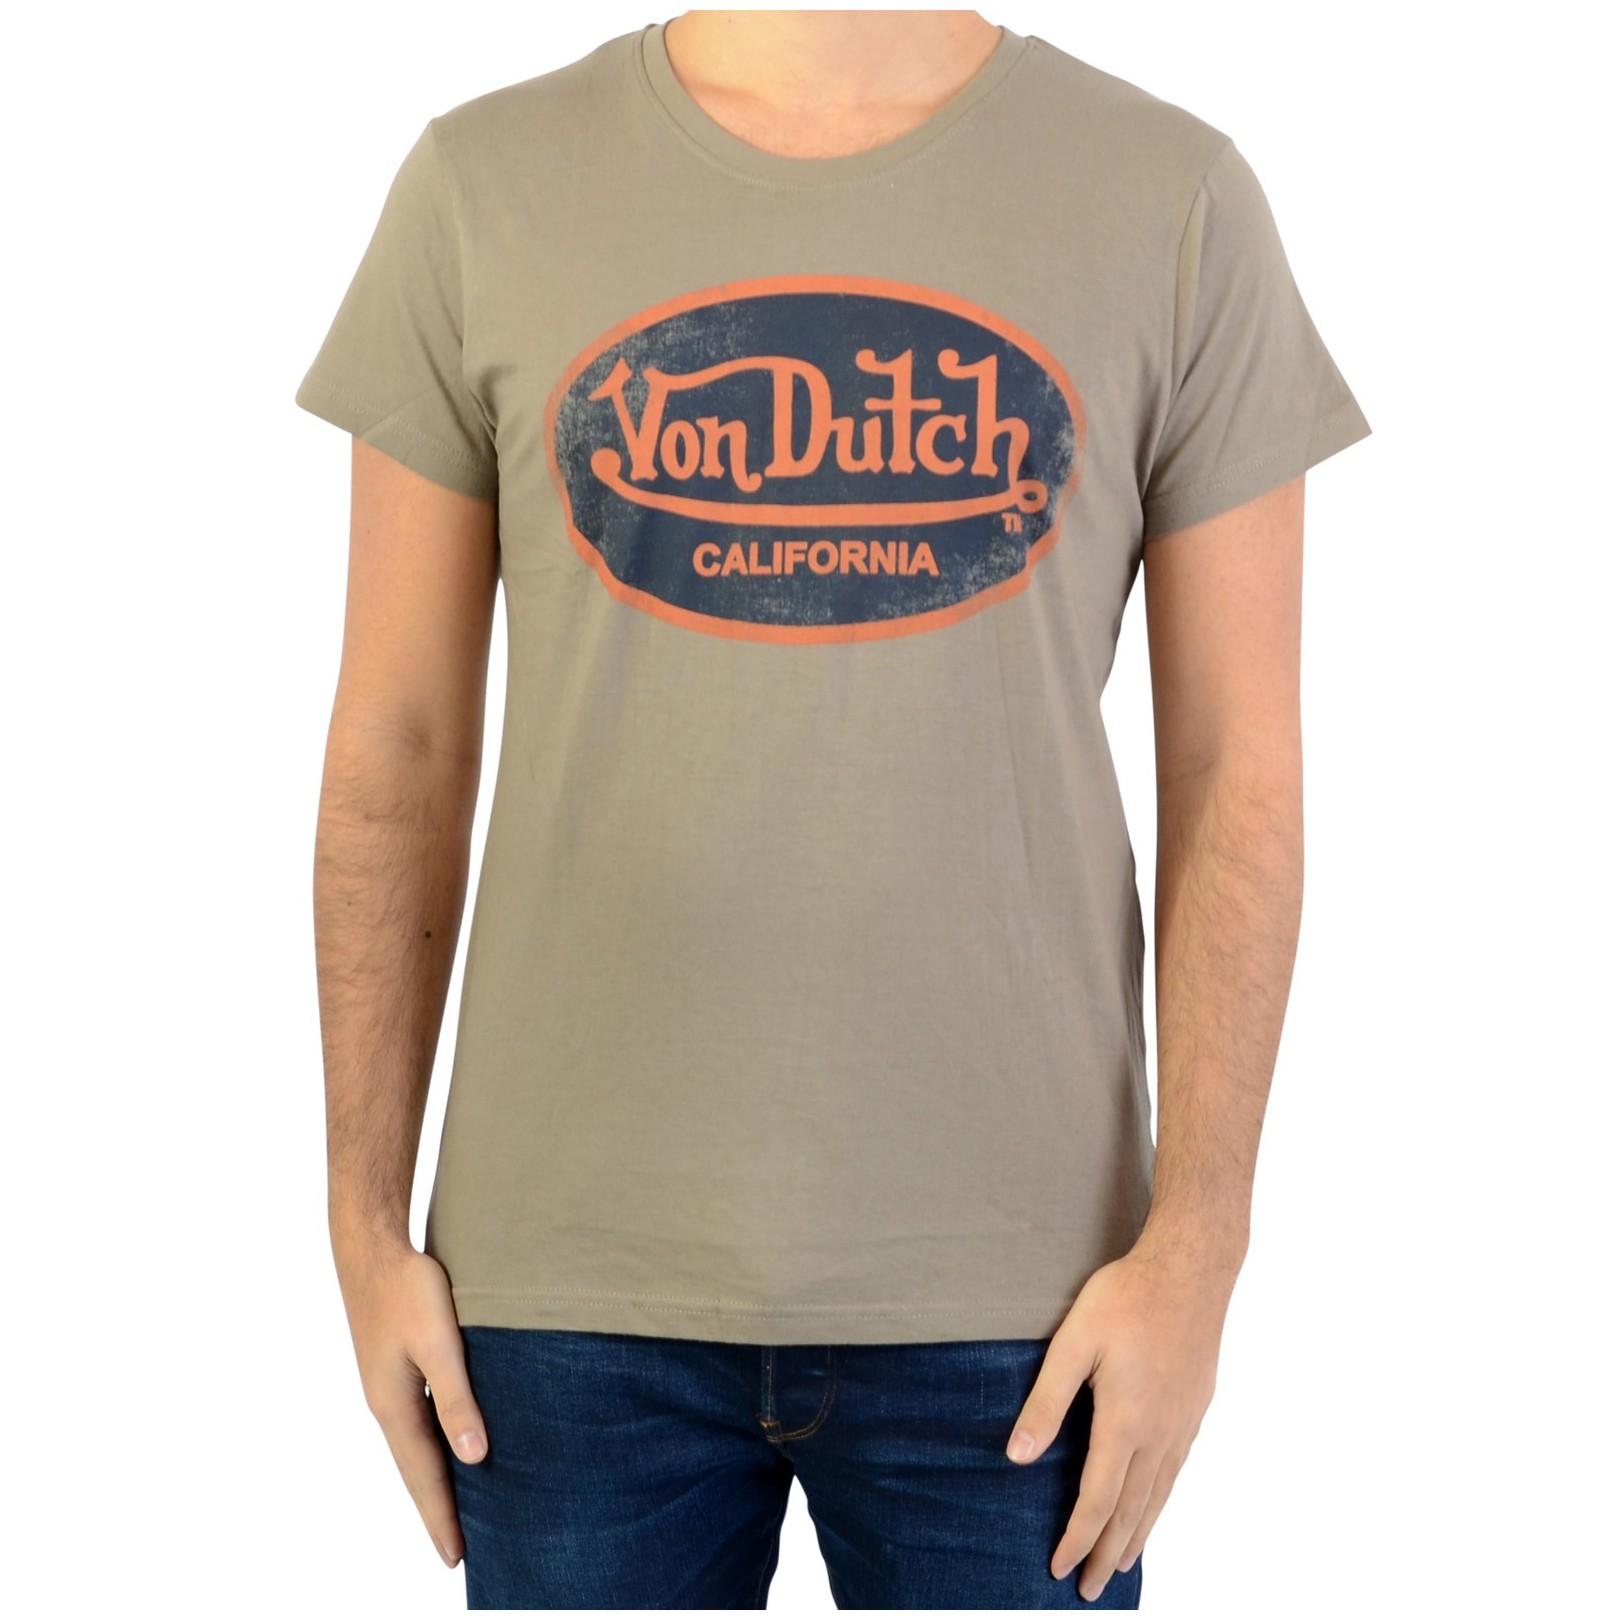 Tee Shirt Von Dutch Aaron 07 Kaki/Navy